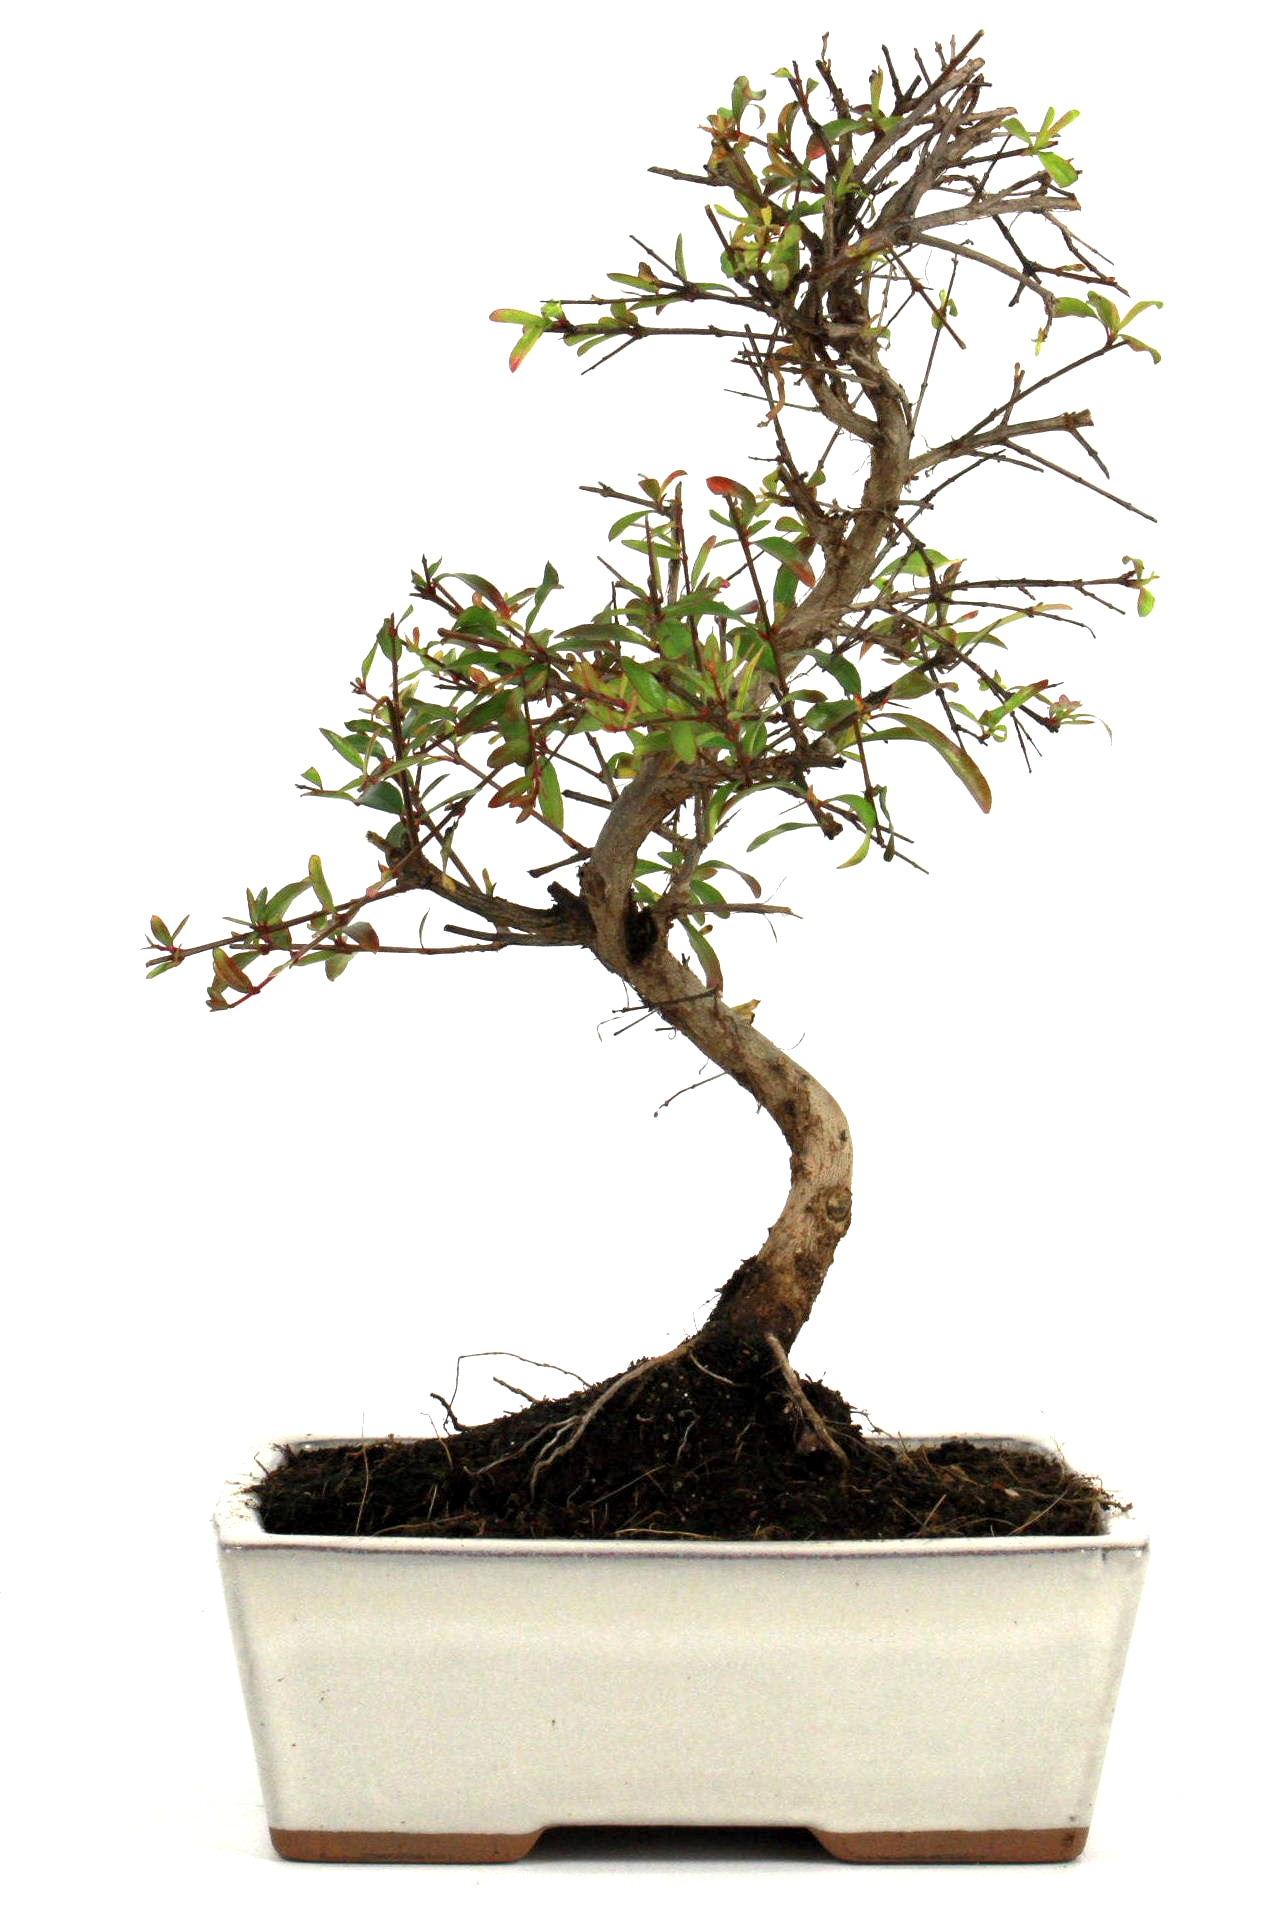 granatapfel bonsai 25 30 cm 163 bei oyaki bonsai kaufen. Black Bedroom Furniture Sets. Home Design Ideas